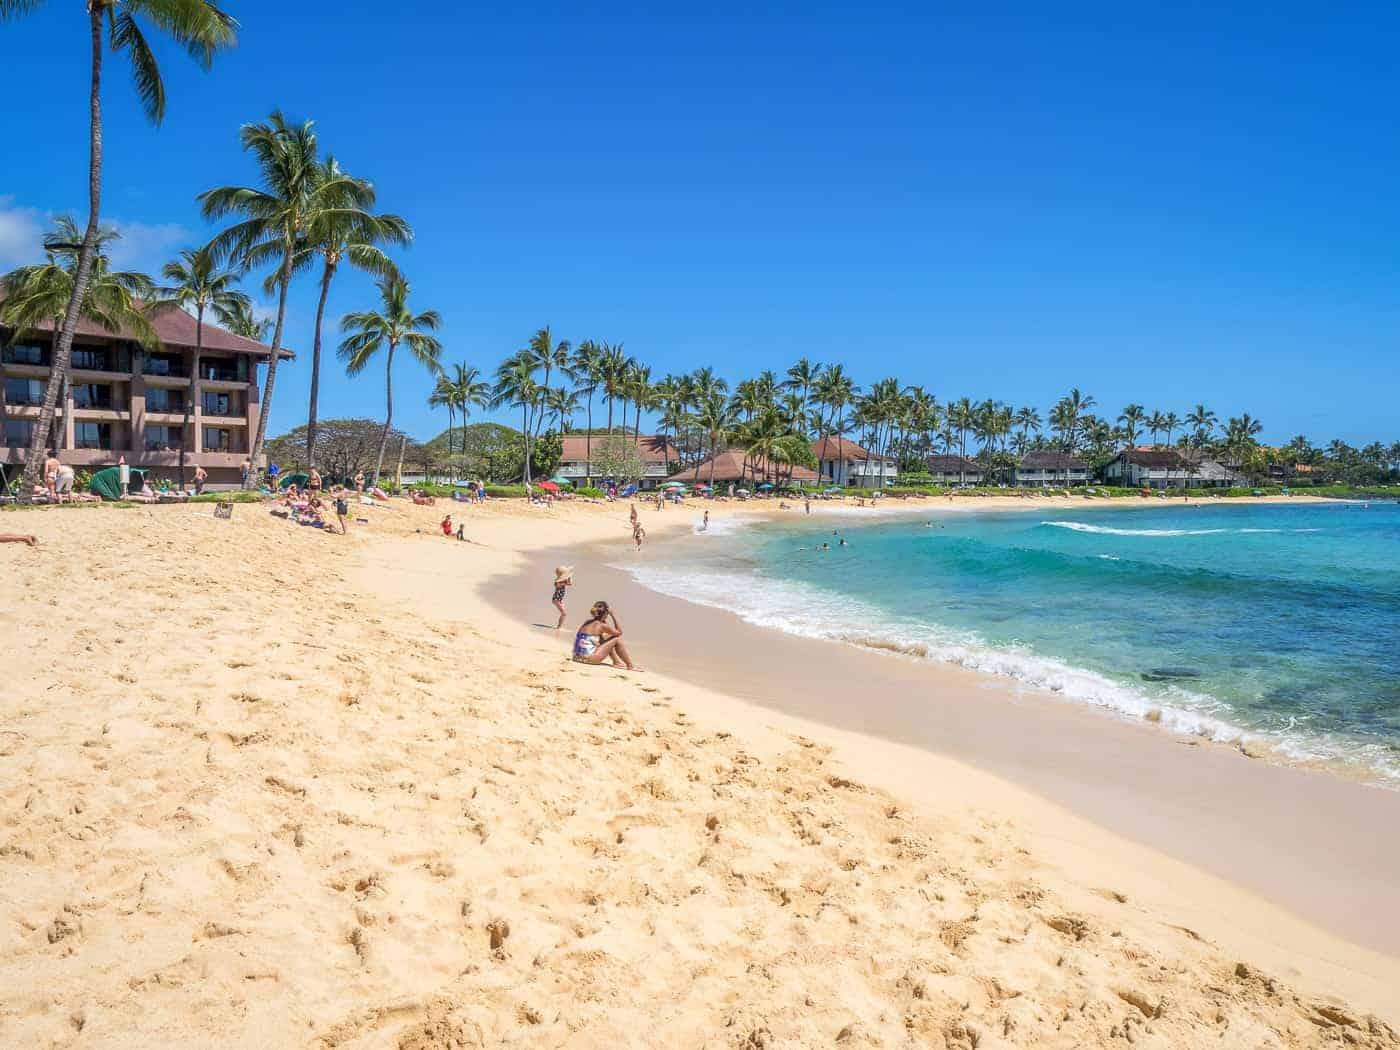 kauai itinerary 7 days